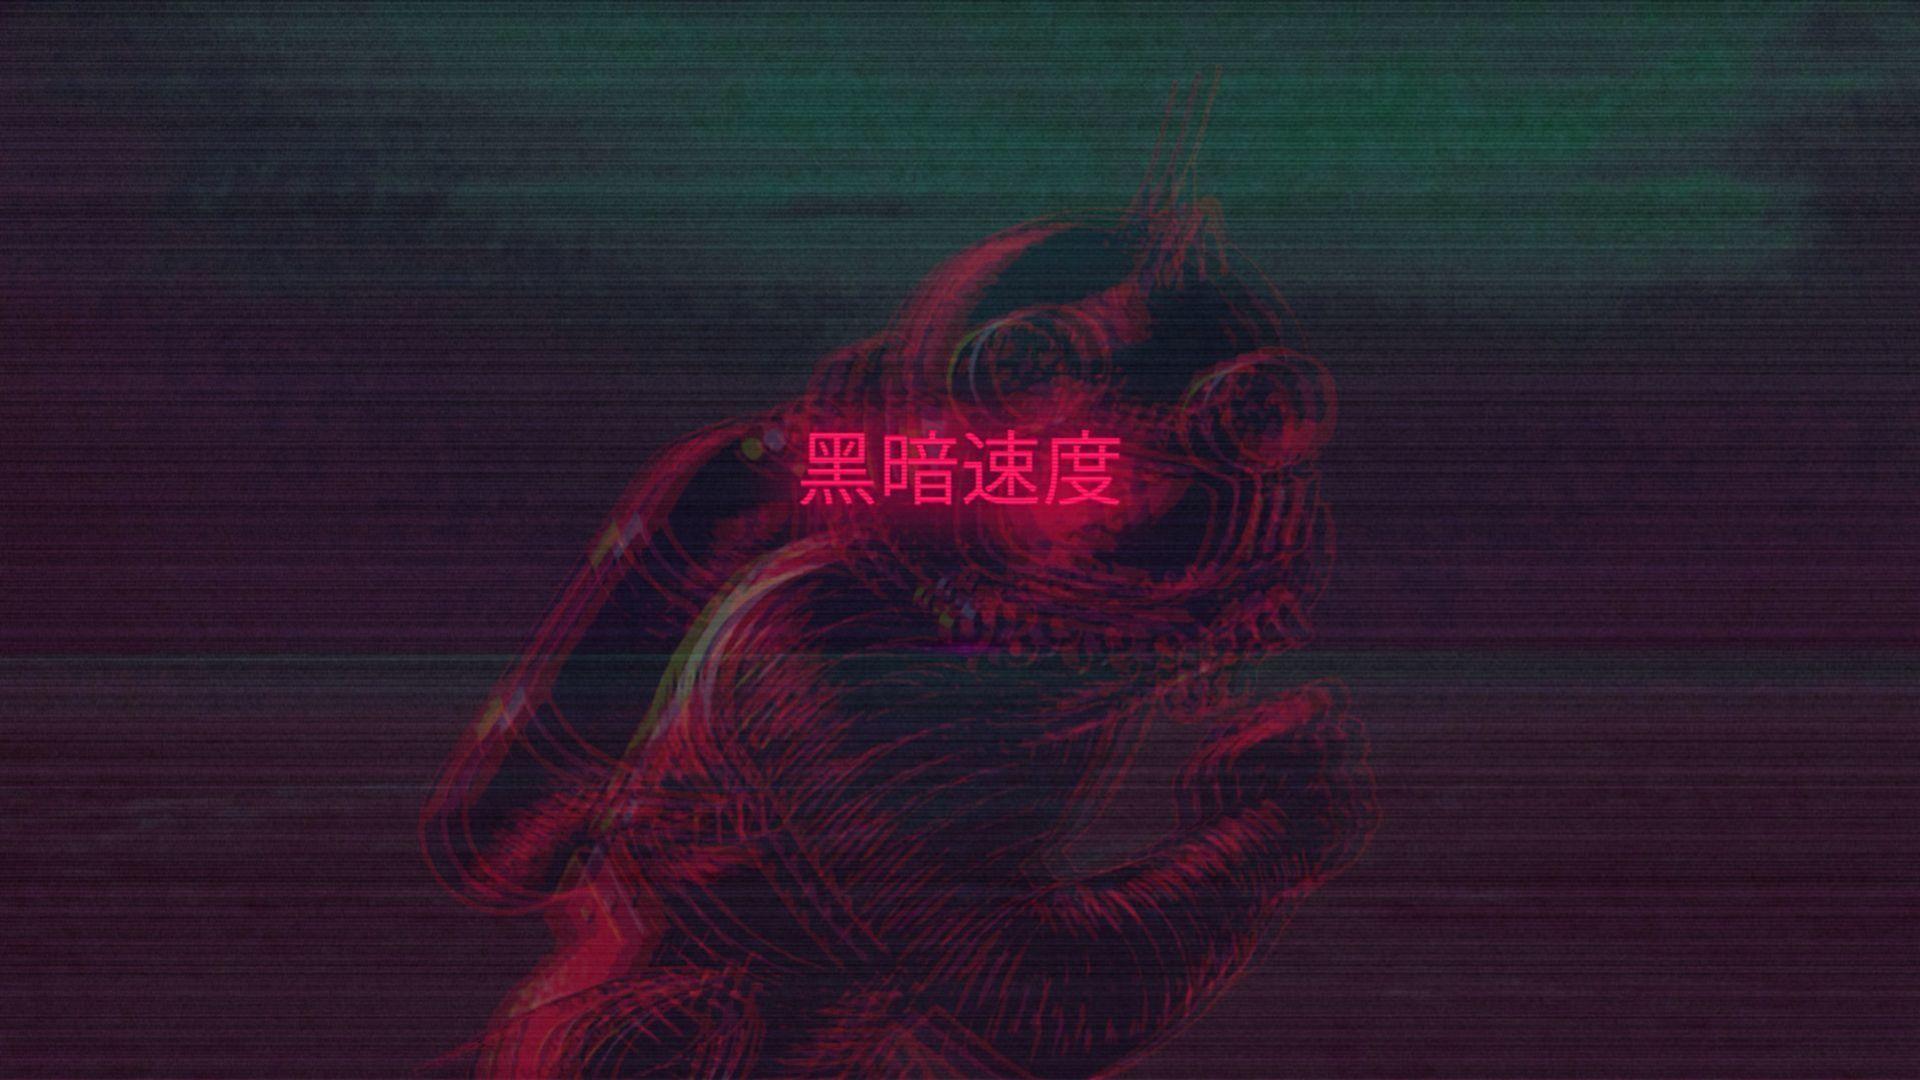 This gif has everything glitch pixel art graphic design vaporwave - Vaporwave Vaporwave Wallpaperunknown Quotesglitch Artfamous